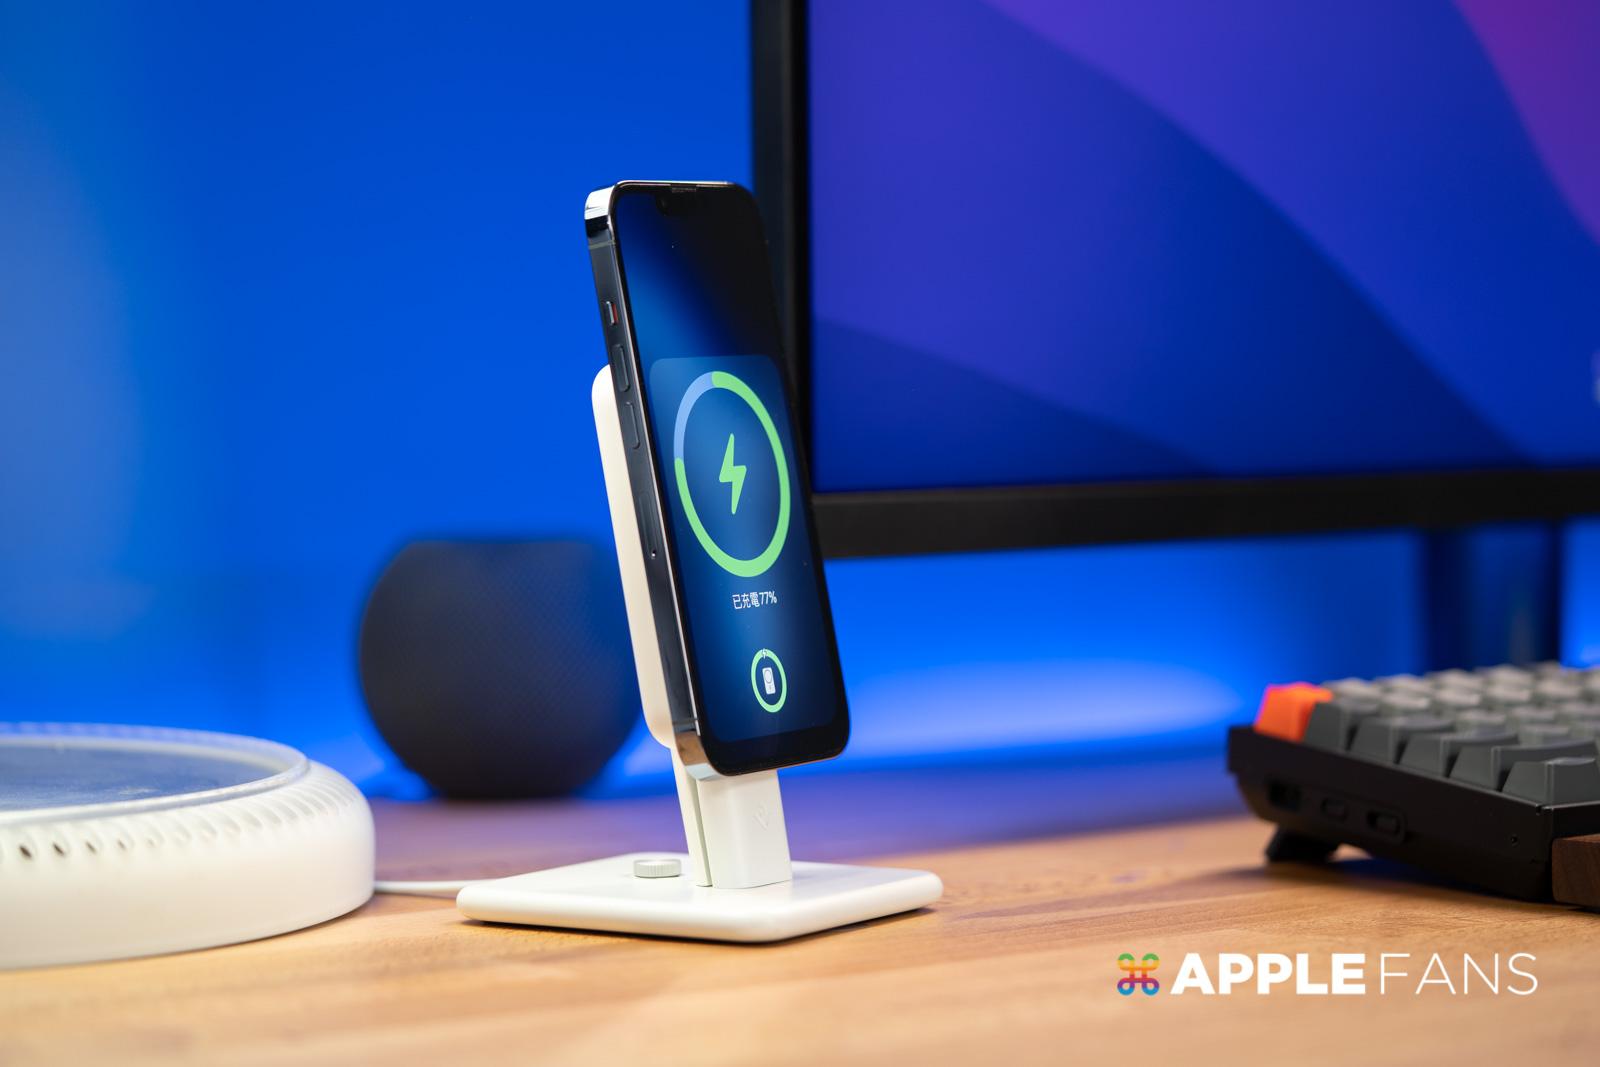 iPhone 13 Pro 搭配 MagSafe 行動電源